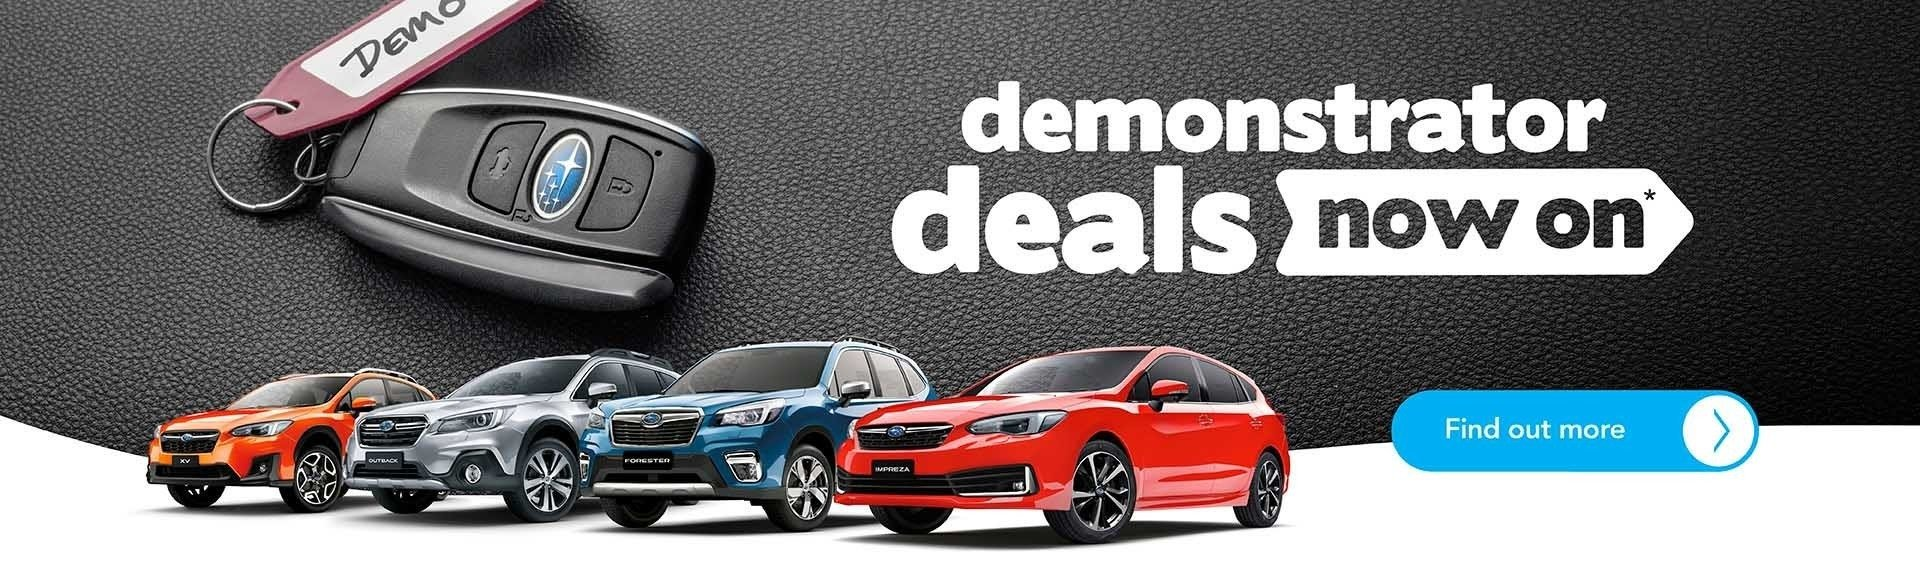 Subaru Narellan - Demonstrator Sale on now